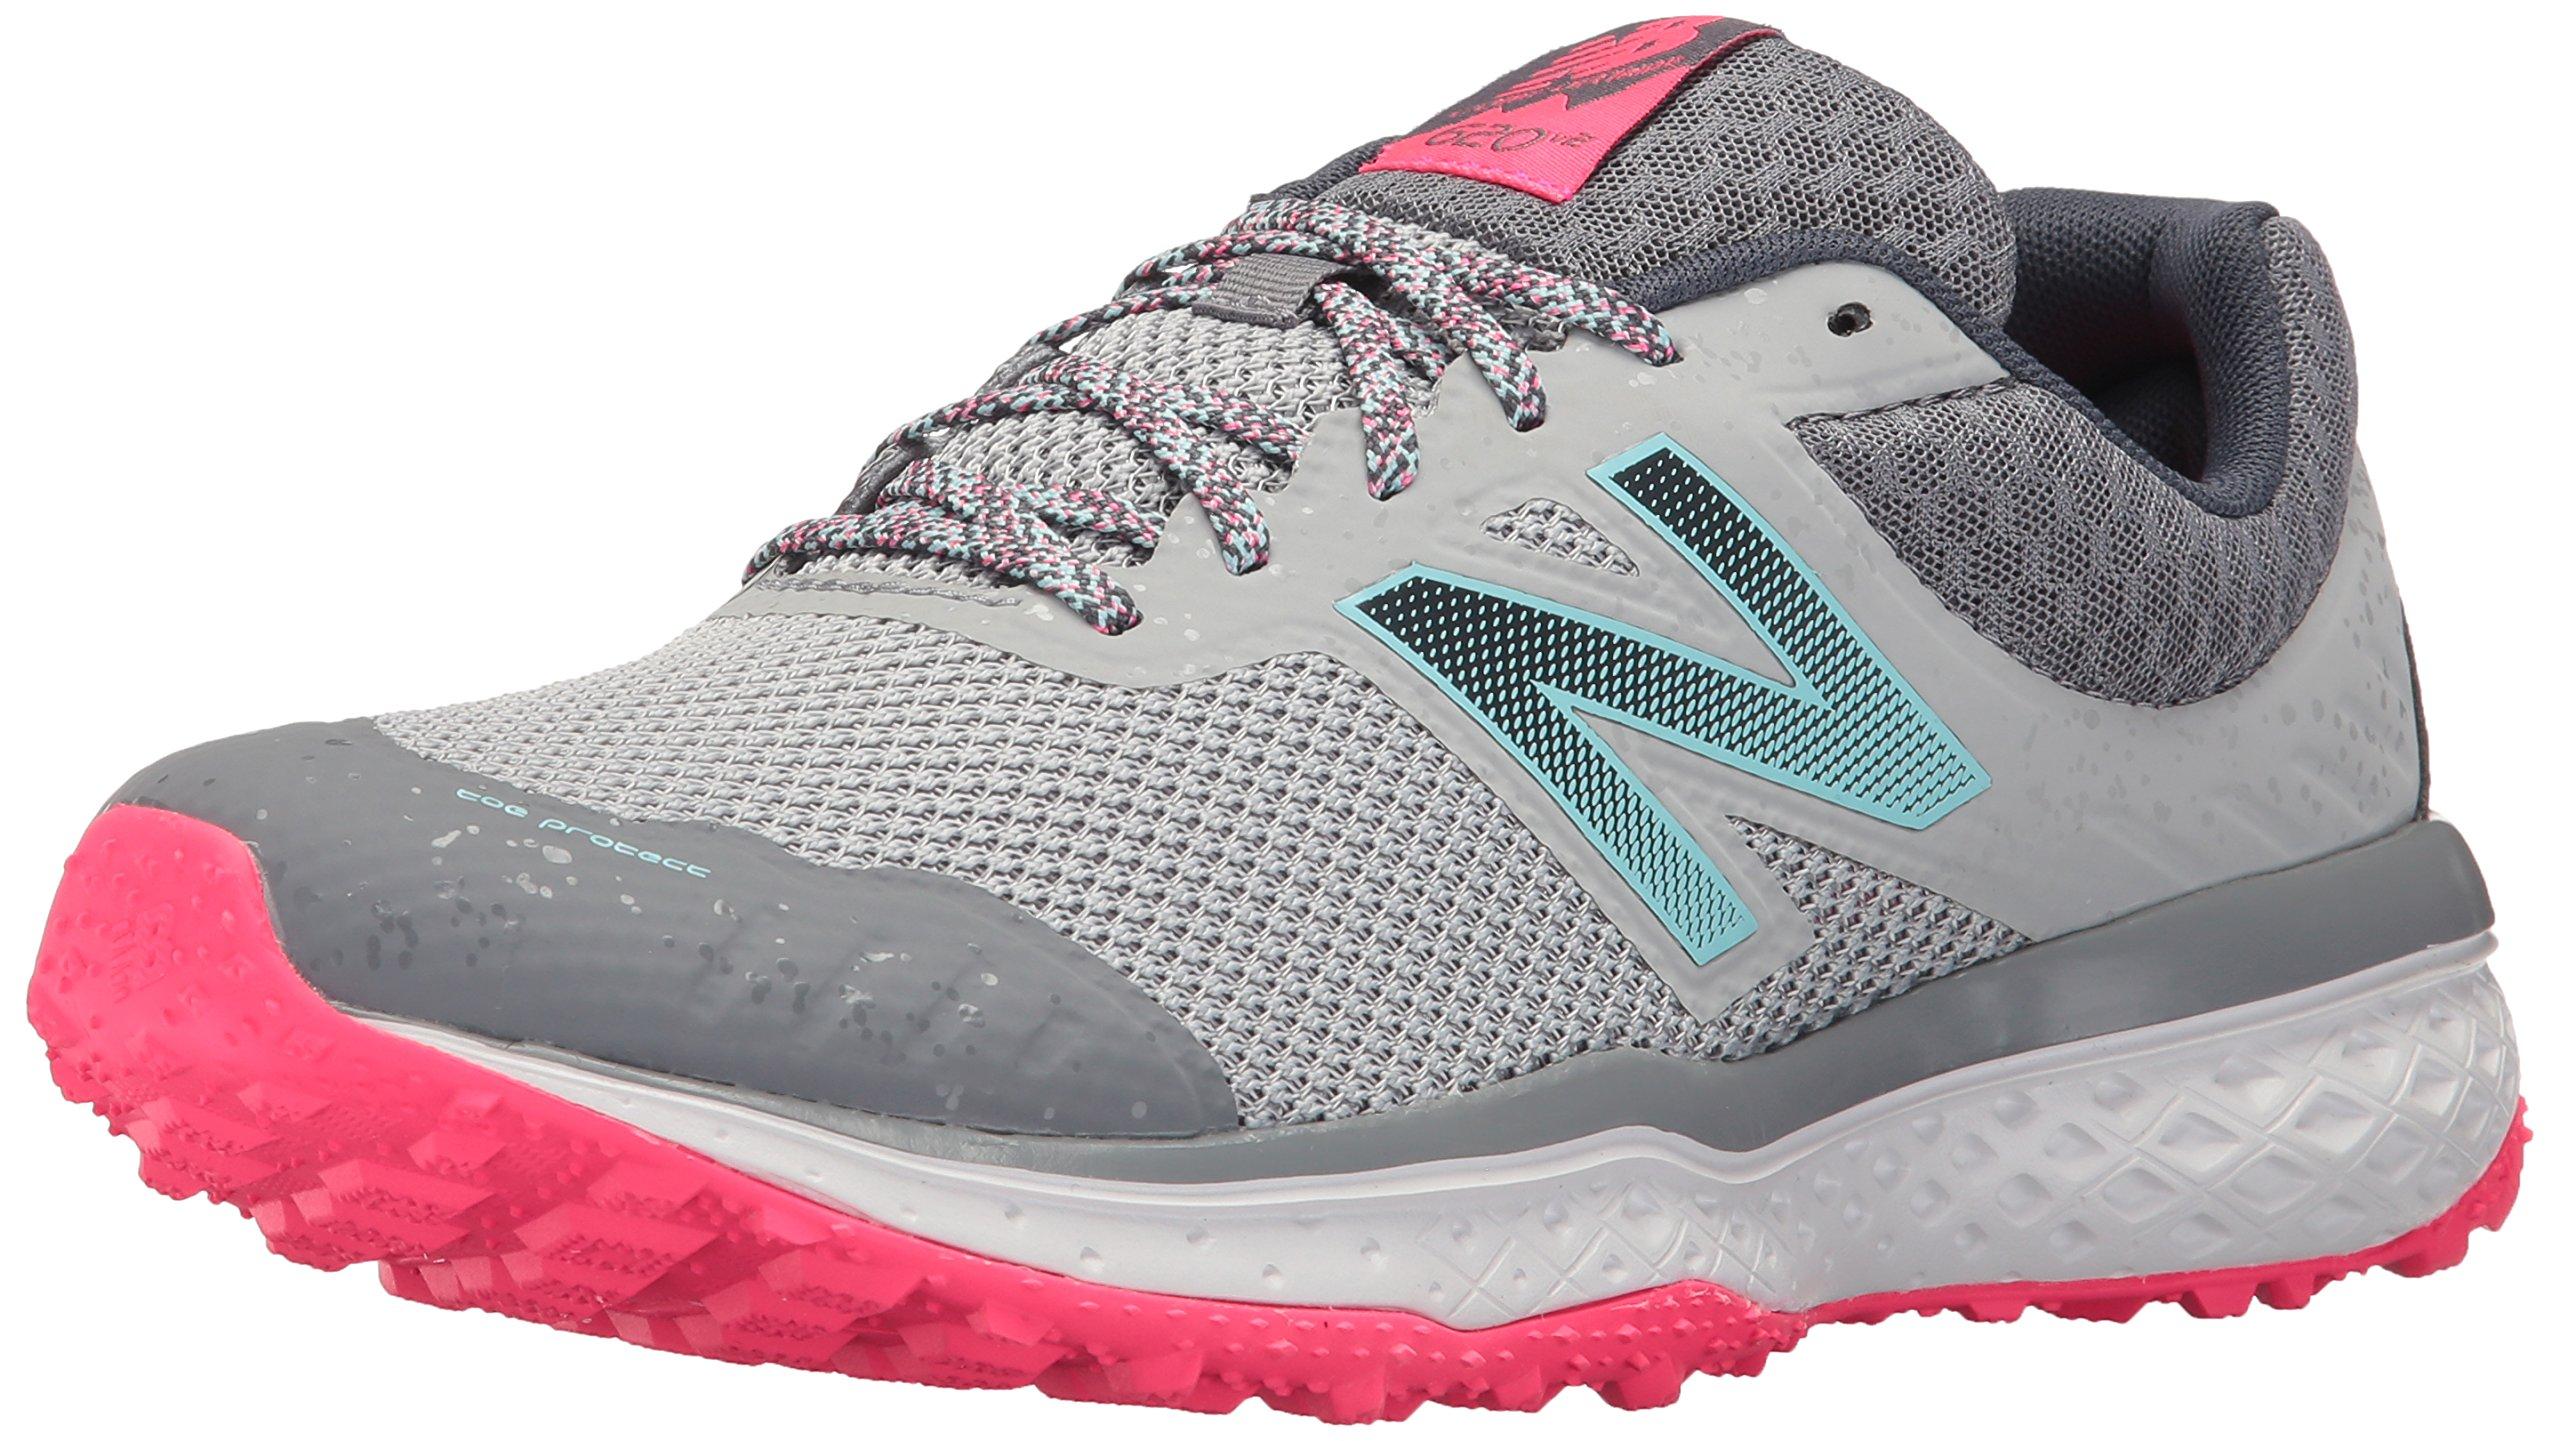 New Balance Women's Cushioning 620v2 Trail Running Shoe, Silver Mink/Gunmetal, 7.5 B US